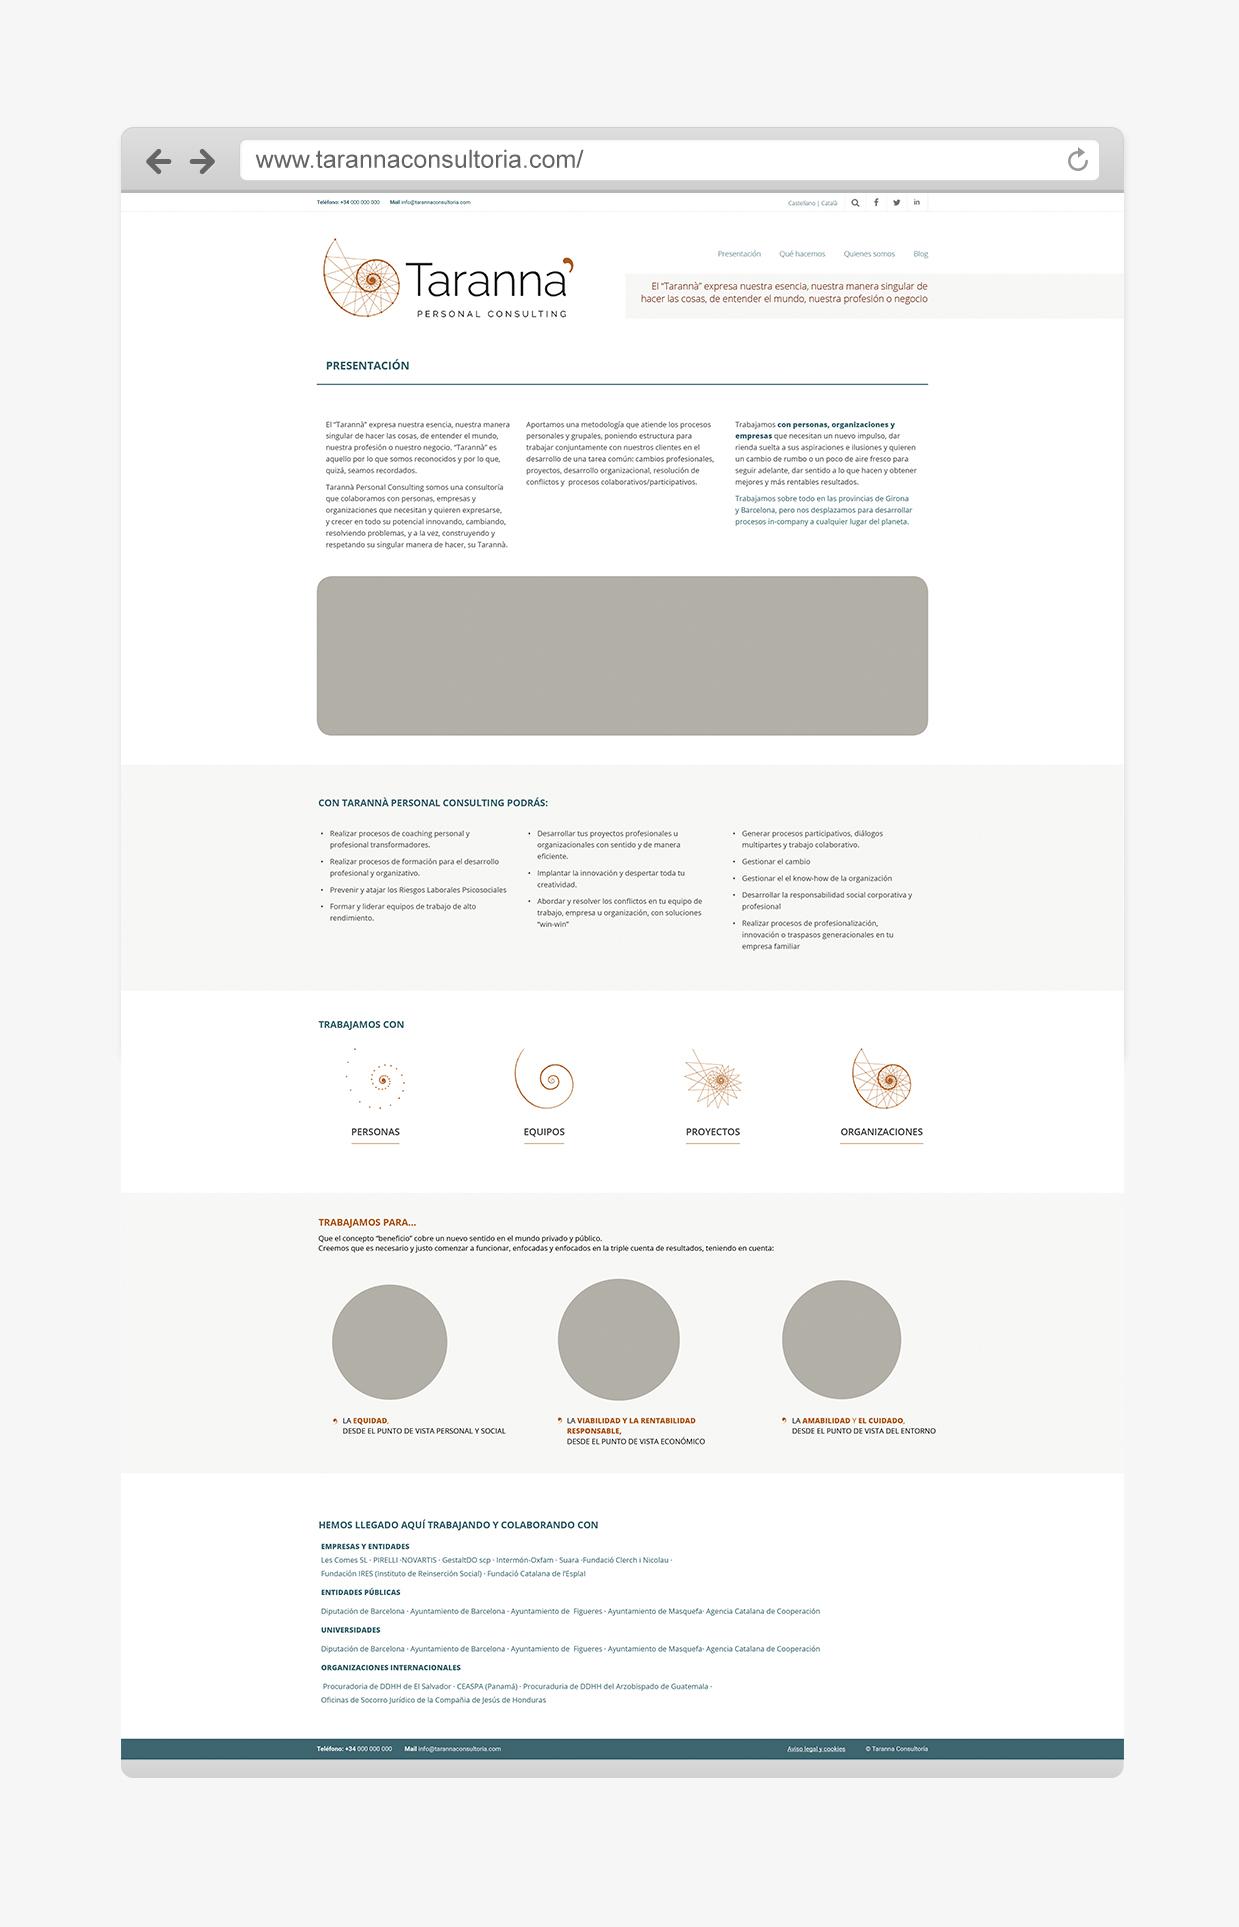 Taranna_browser.jpg